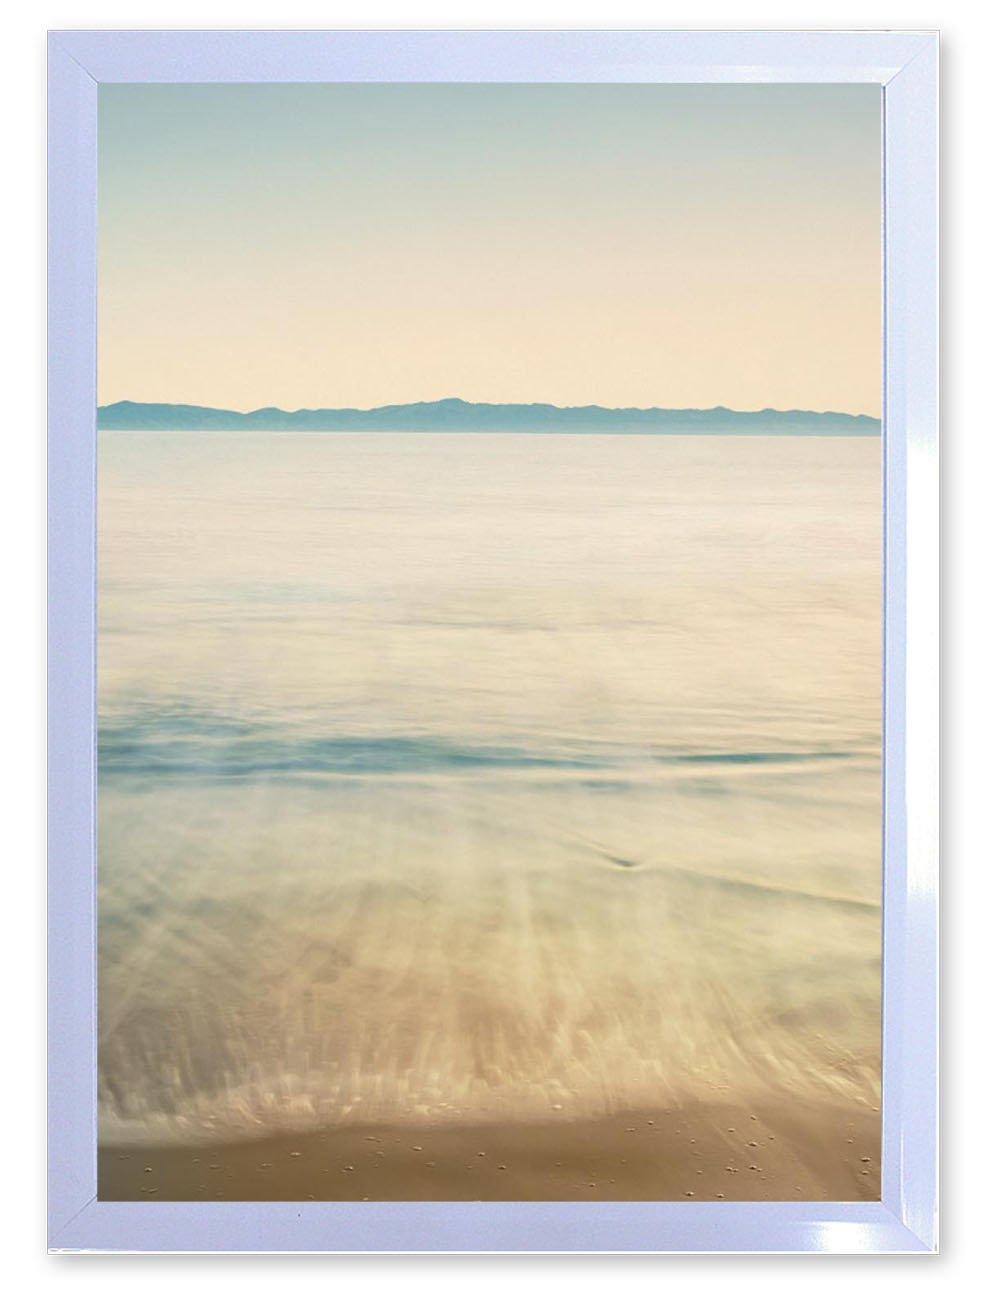 【DXポスター】風景写真のポスター フレーム付き海 サーフ ハワイ 西海岸 リゾート モダン 現代アートP-A2-GLT-1604-0004-wh P-A2-GLT-1604-0004-wh B073SHMLRZA2サイズ(59.4cm×42cm)+ホワイトフレーム